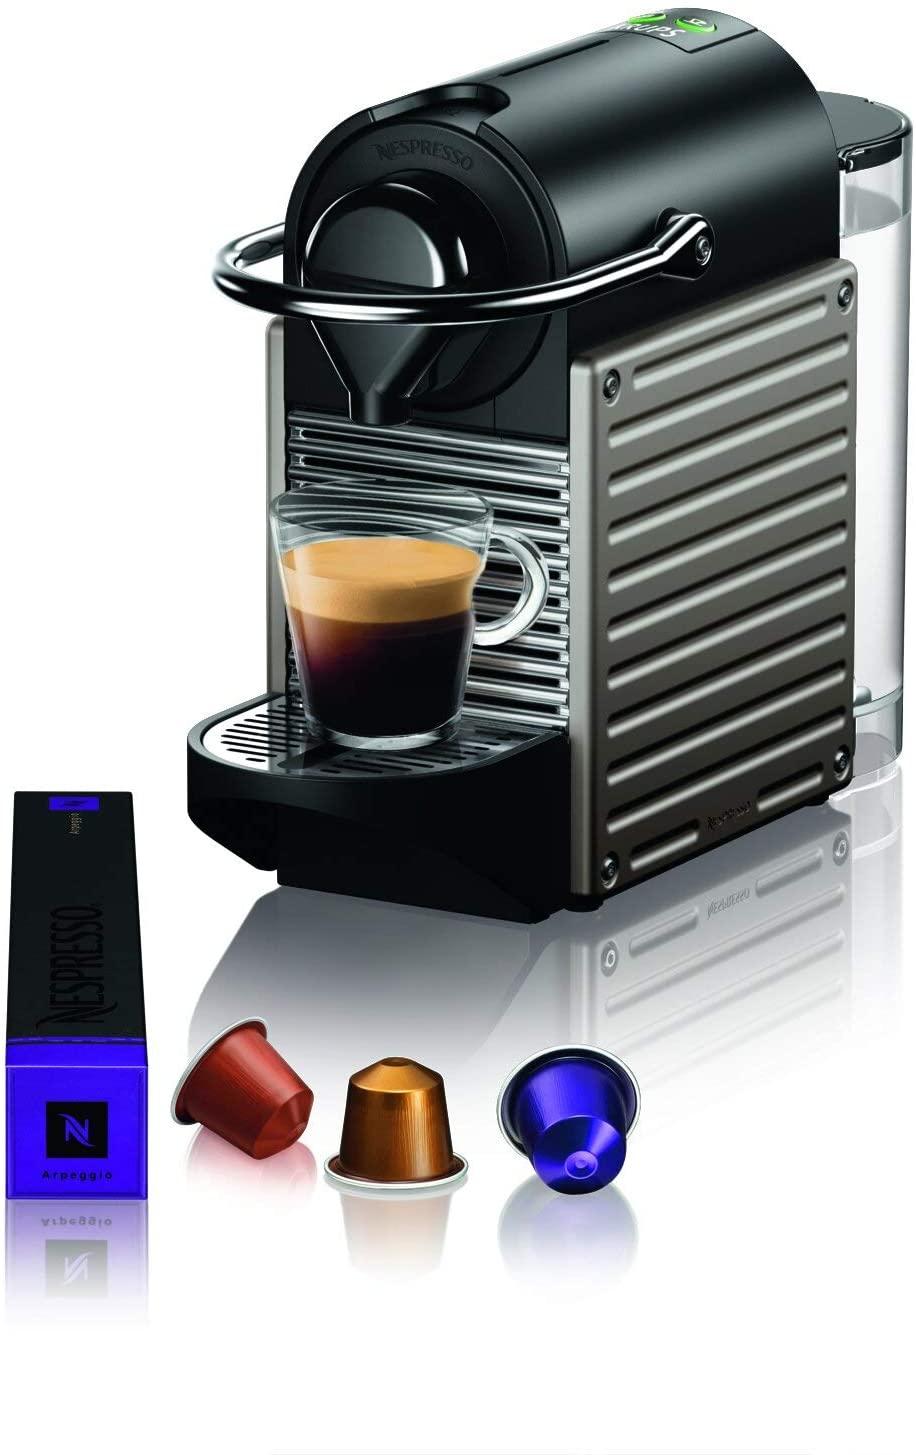 Kapsułkowe ekspresy do kawy - Krups, De'Longhi @ Amazon